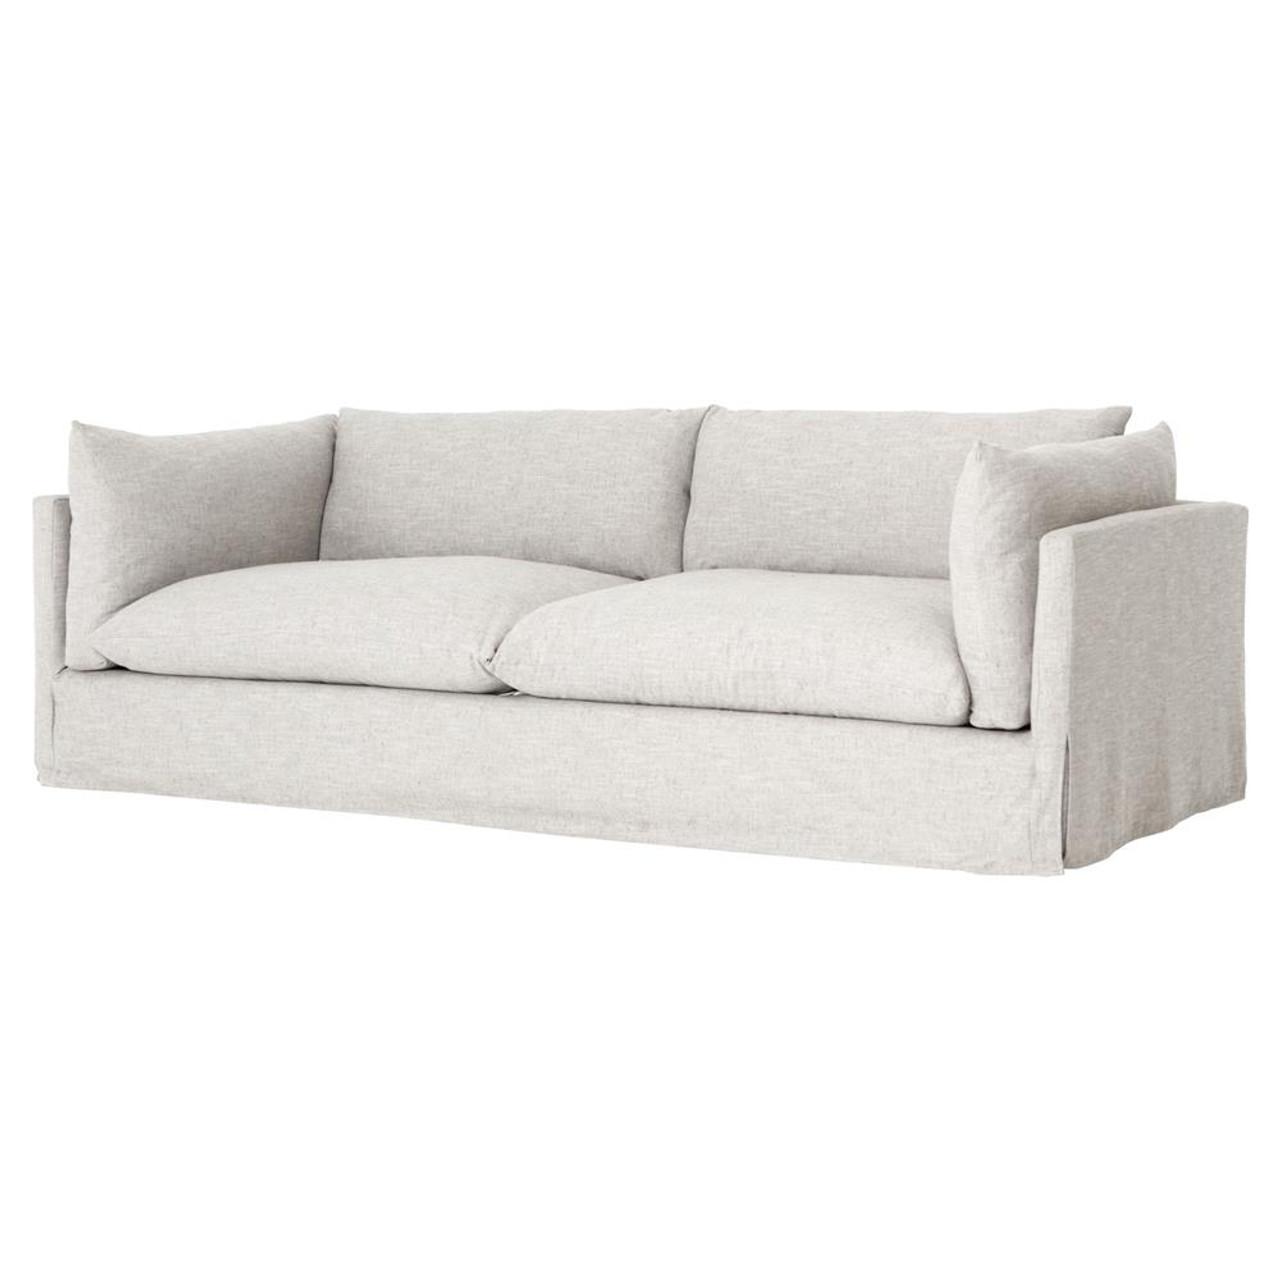 loft modern beige slipcovered lounge sofa 90 zin home rh zinhome com modern chaise lounge sofa bed montauk modern lounge sofa